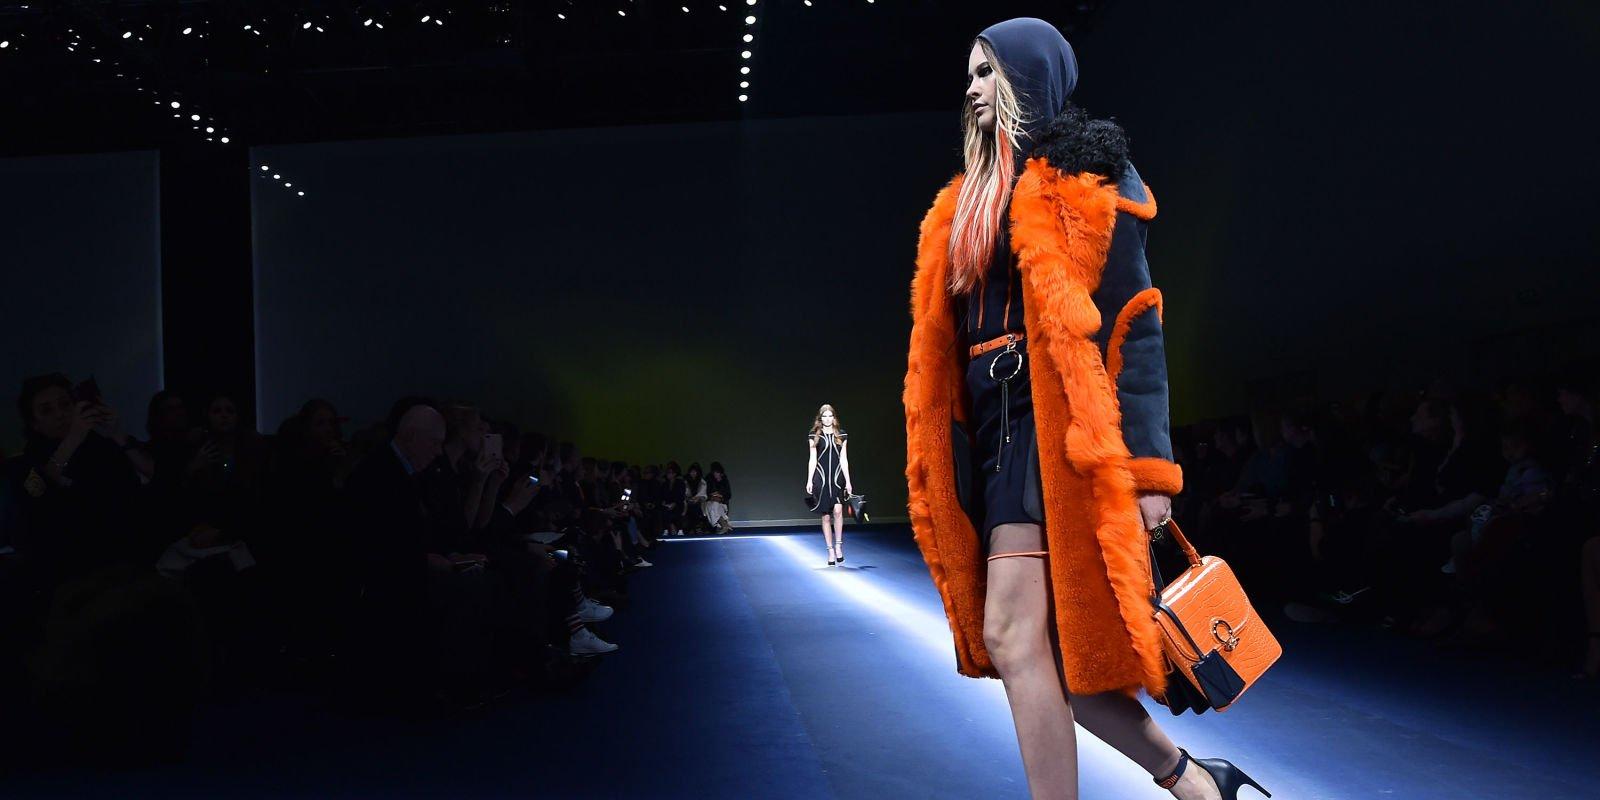 Behati Prinsloo Is Already Back on the Runway at Fashion Week https://t.co/8QoQpydPIQ https://t.co/cchjtzBQsl